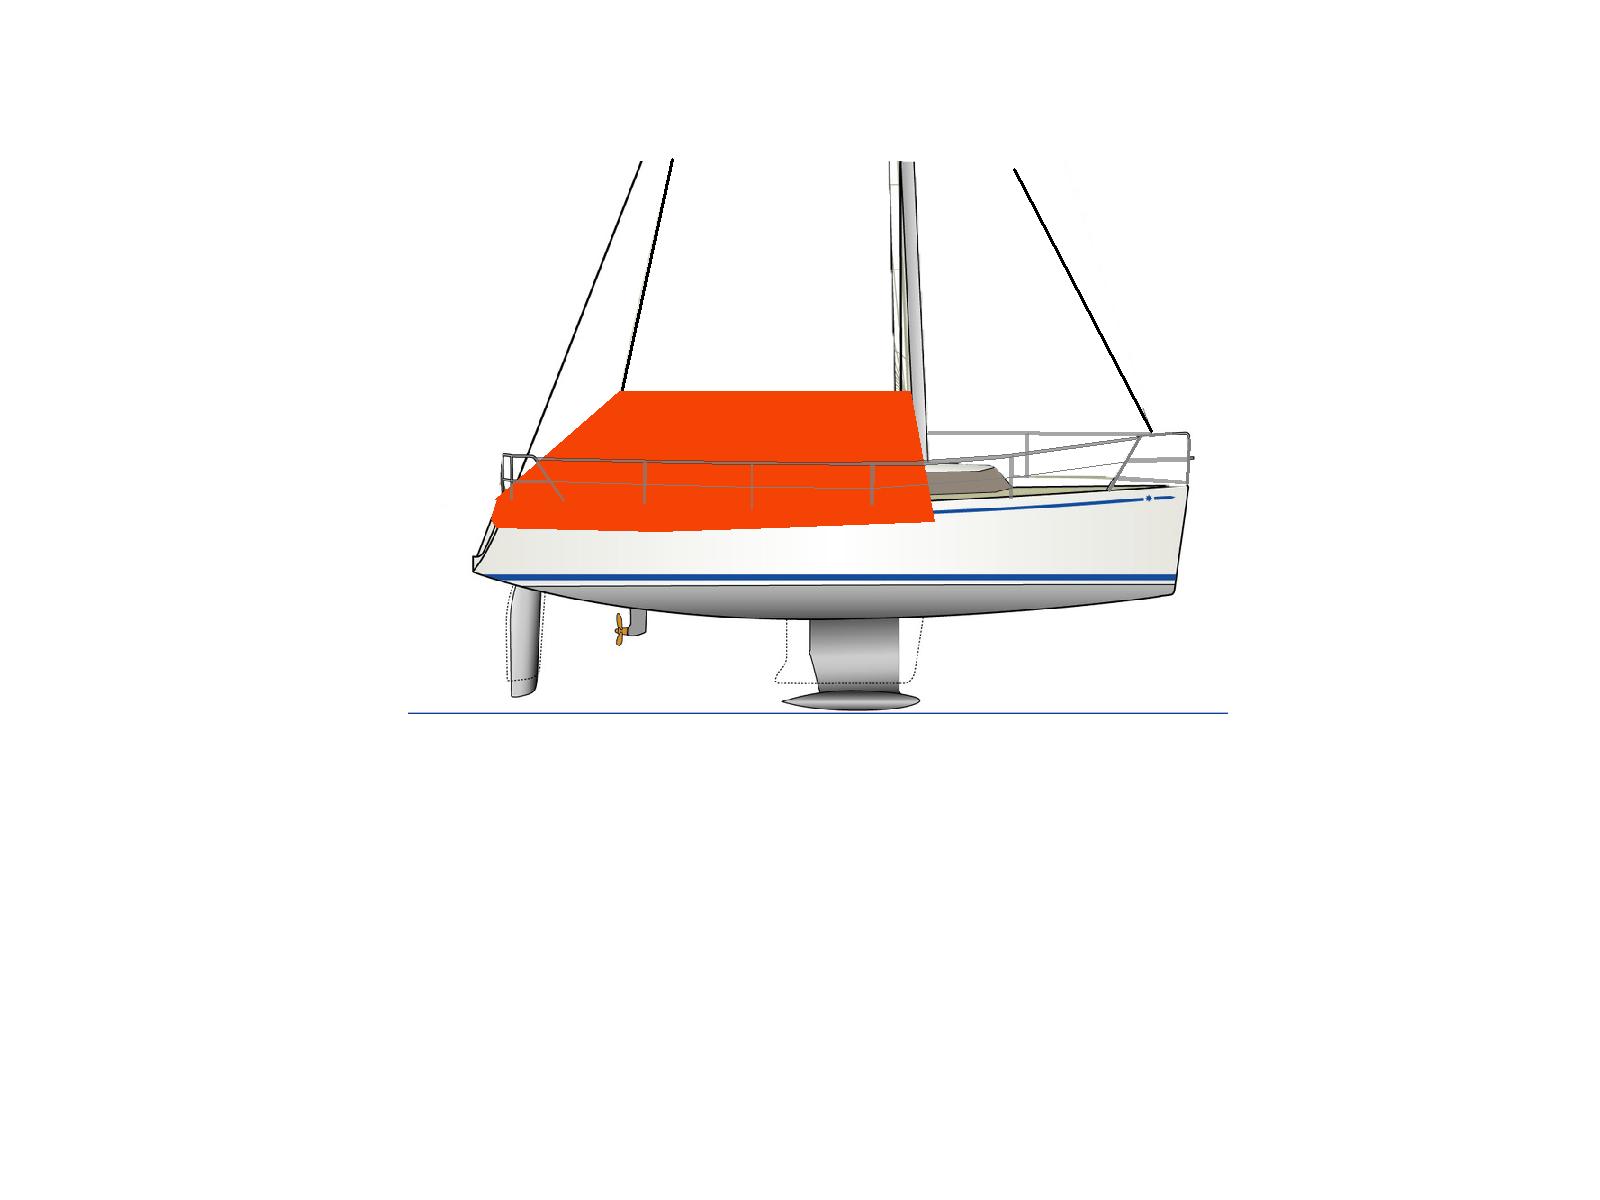 02 02 01 Typ E Segelboot Plichtpersenning unter Reling.PNG02 02 01 Typ E Segelboot Plichtpersenning unter Reling